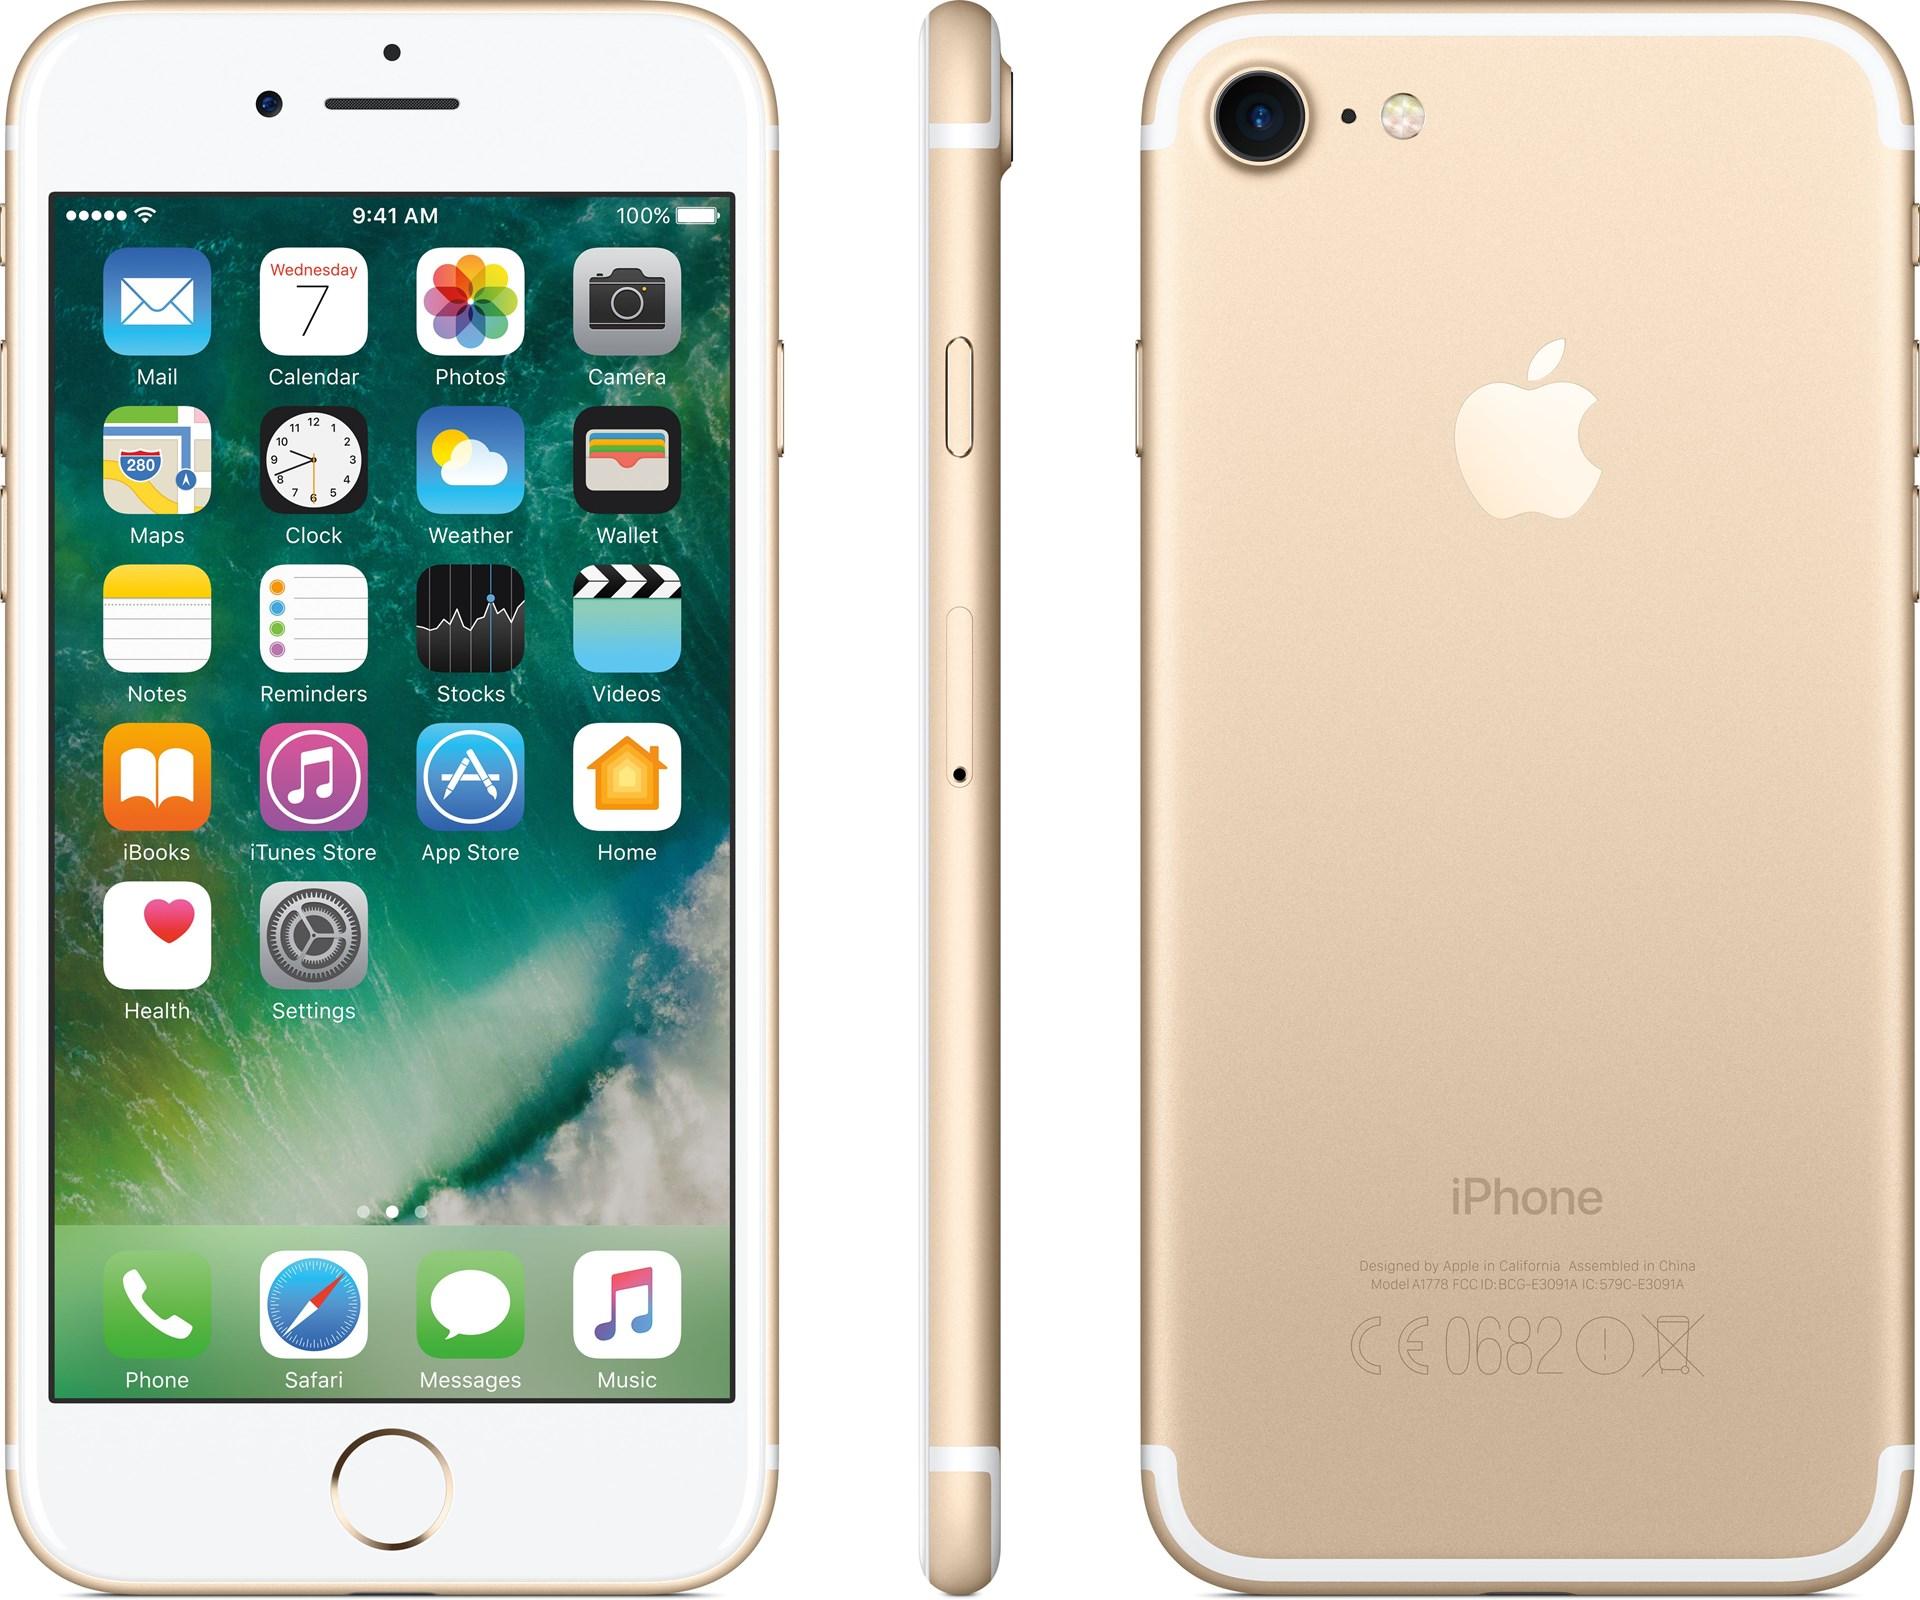 Apple iPhone 7 128GB Gold - iPhone 7 med imponerande prestanda